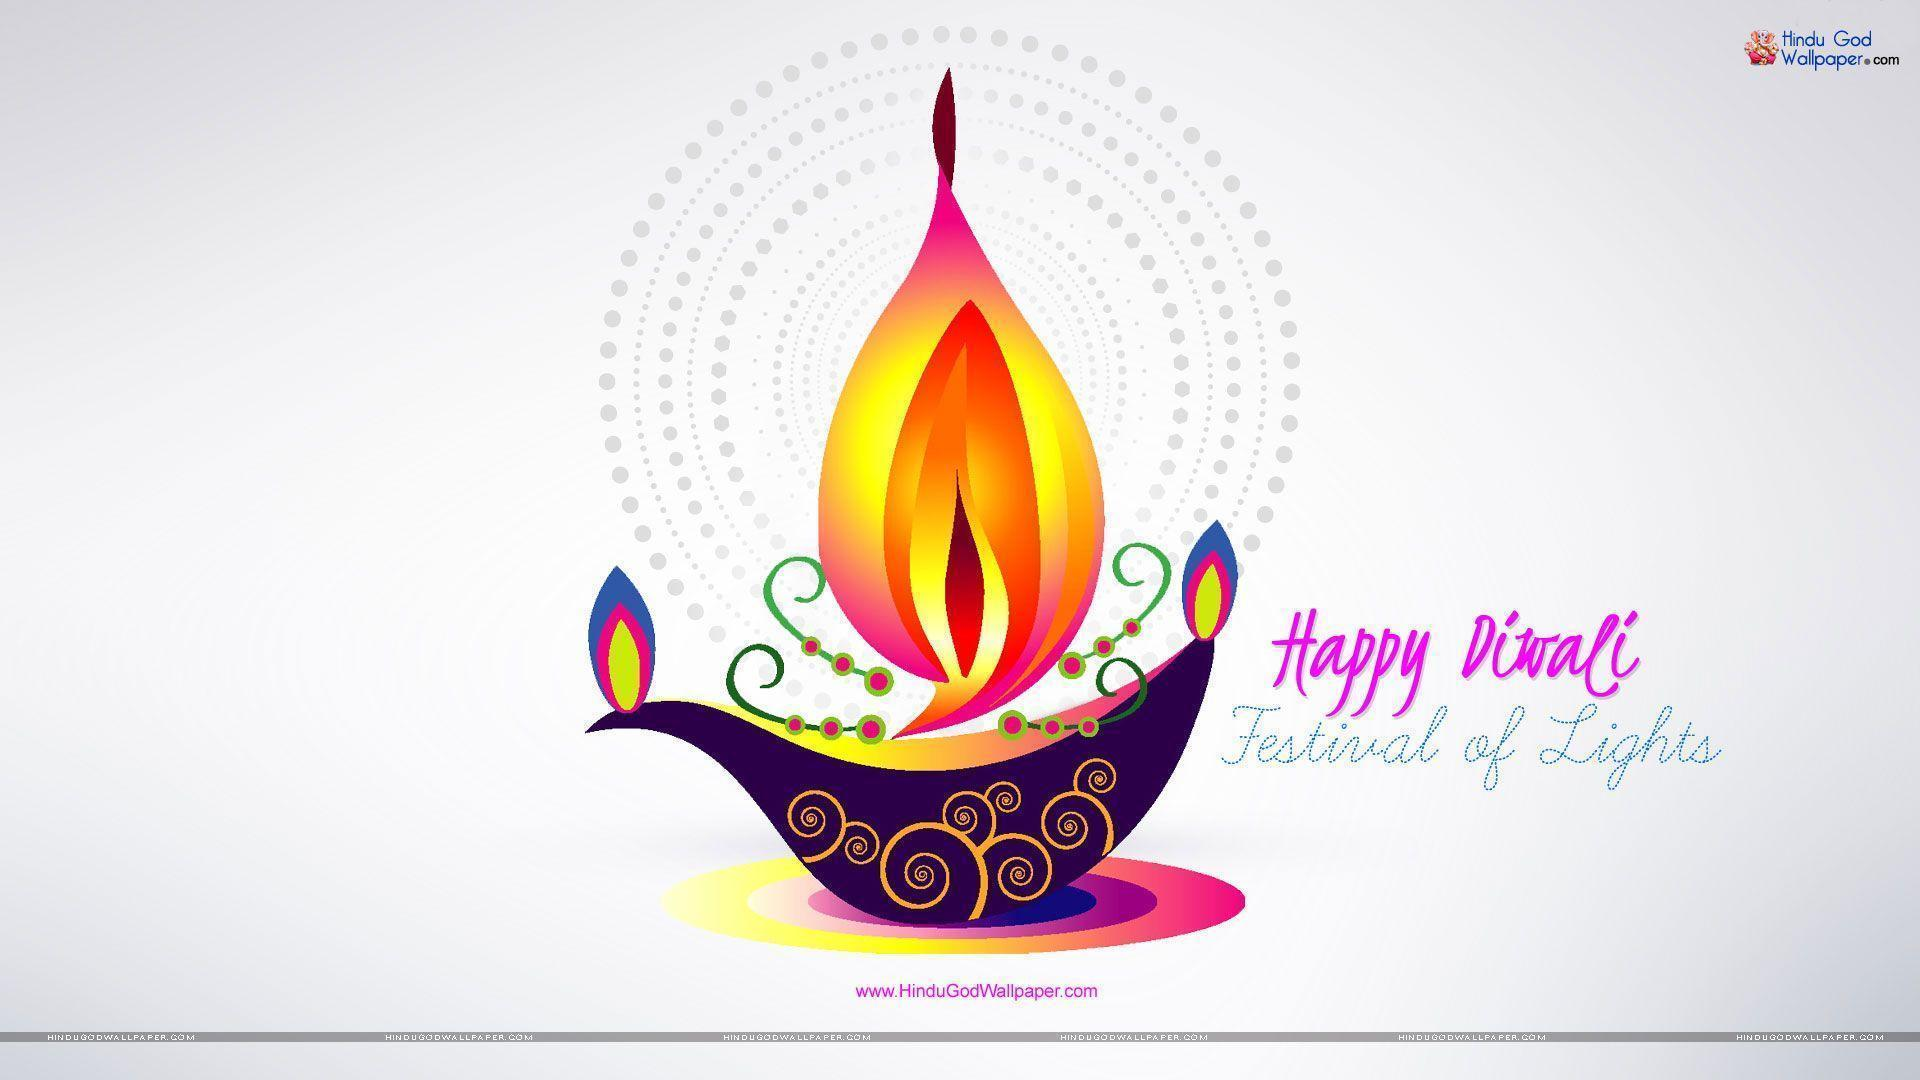 Diwali Wallpapers 1080p HD Widescreen Download